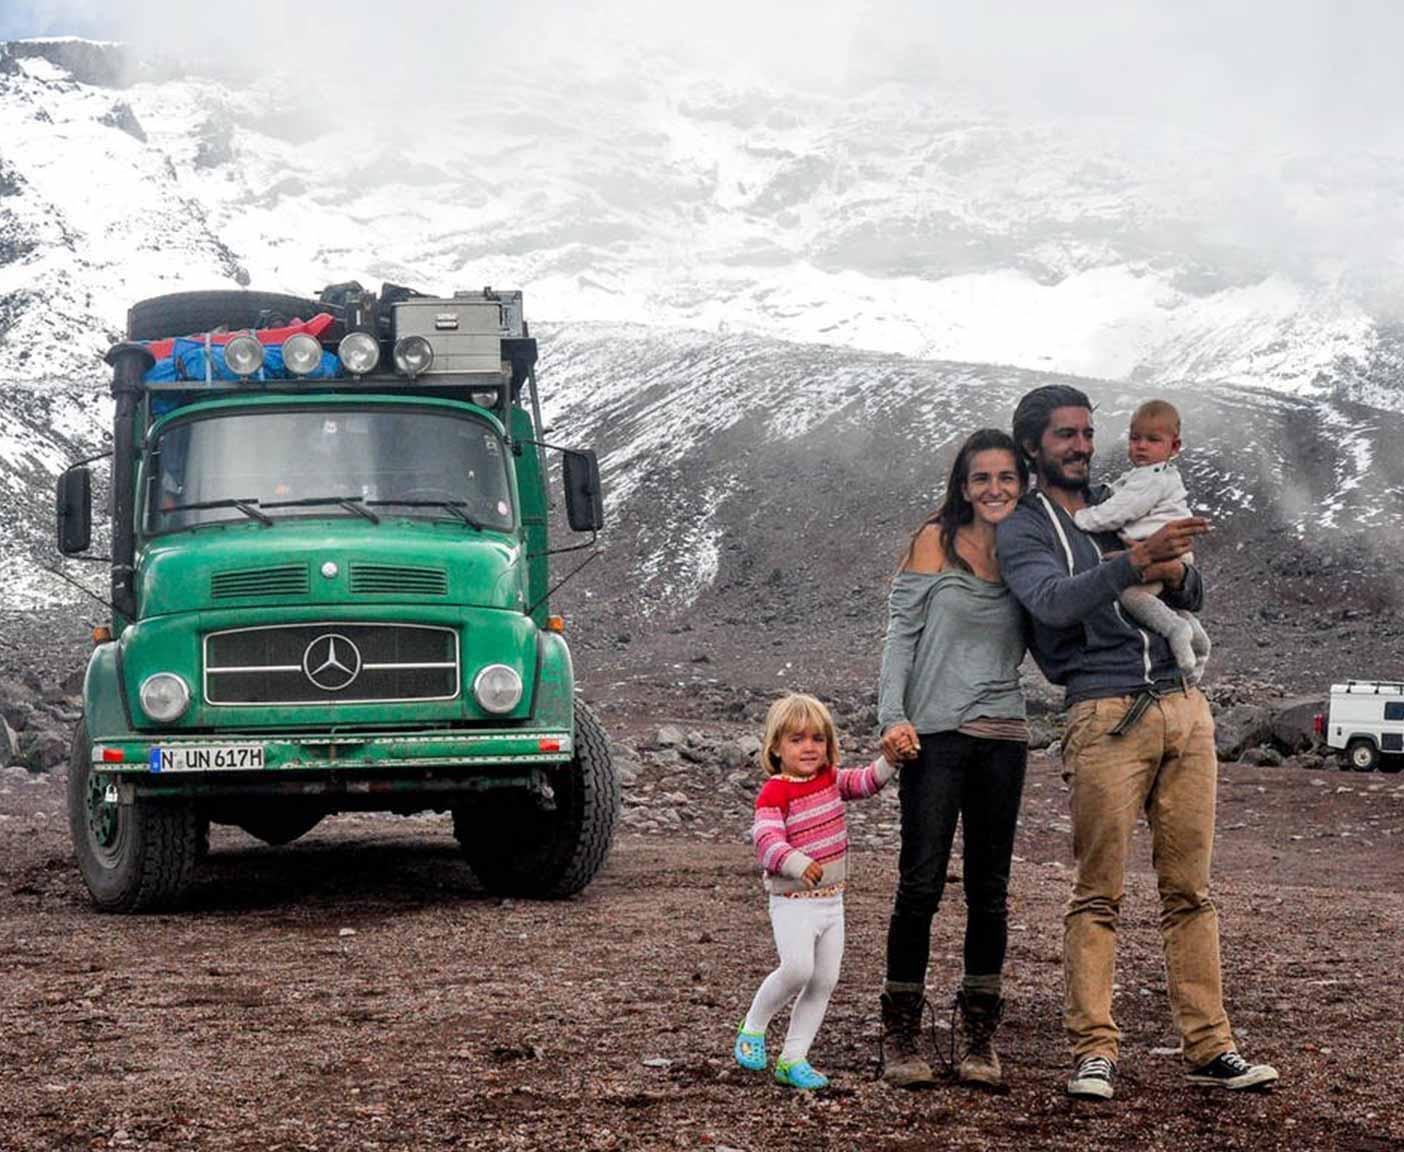 mercedes-LA-911-B-hippie-trail-kurzhauber-4x4-wohnmobil-panamericana-argeninien